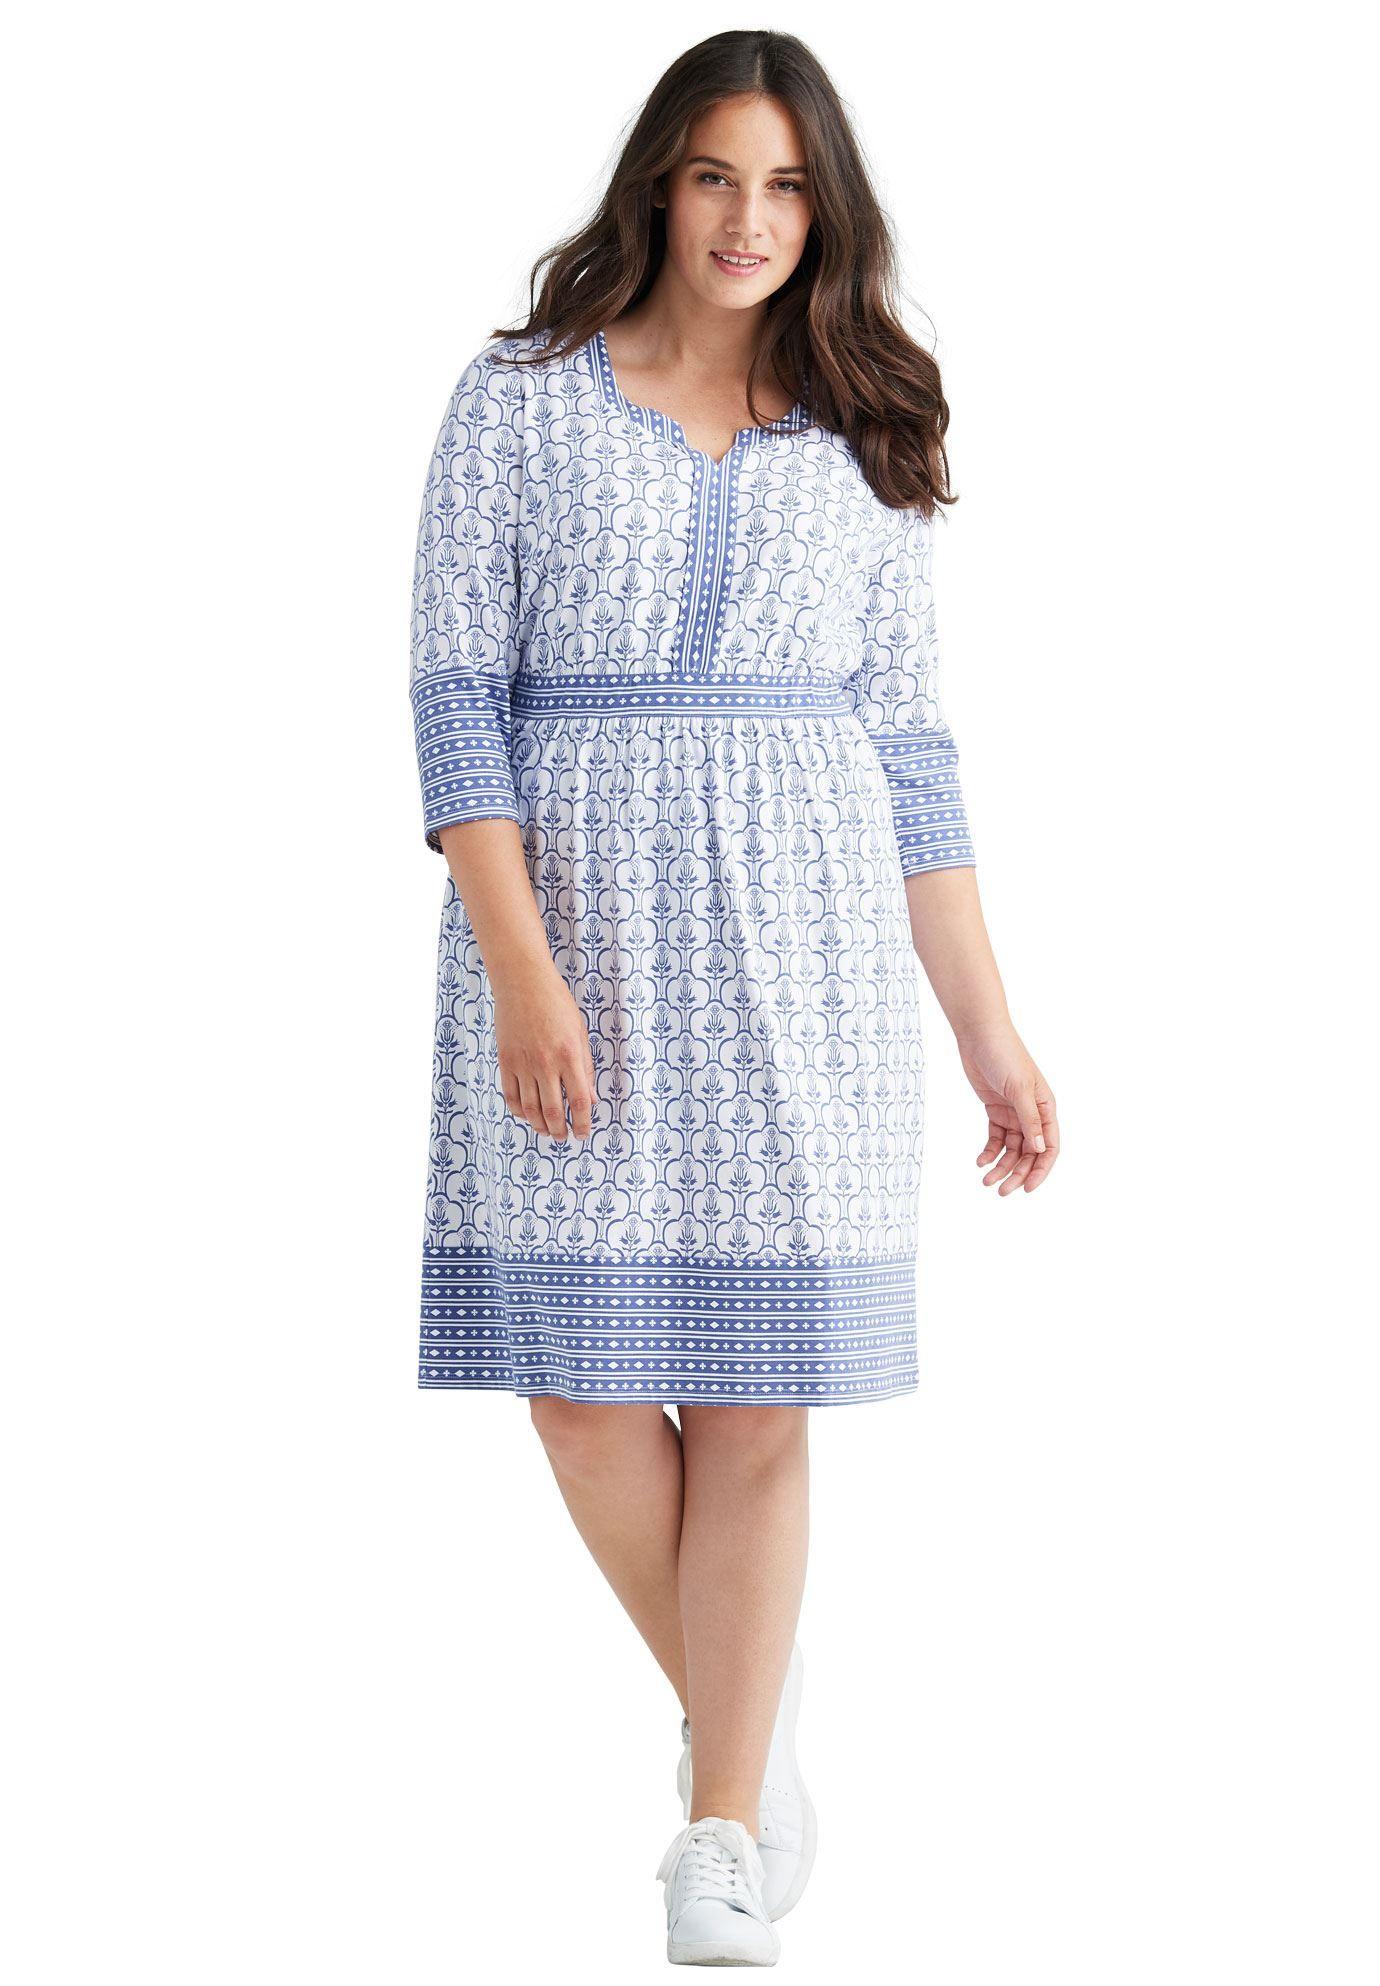 1b6445882ce7c Mixed Print Empire Waist Dress by Ellos reg  - Women s Plus Size Clothing